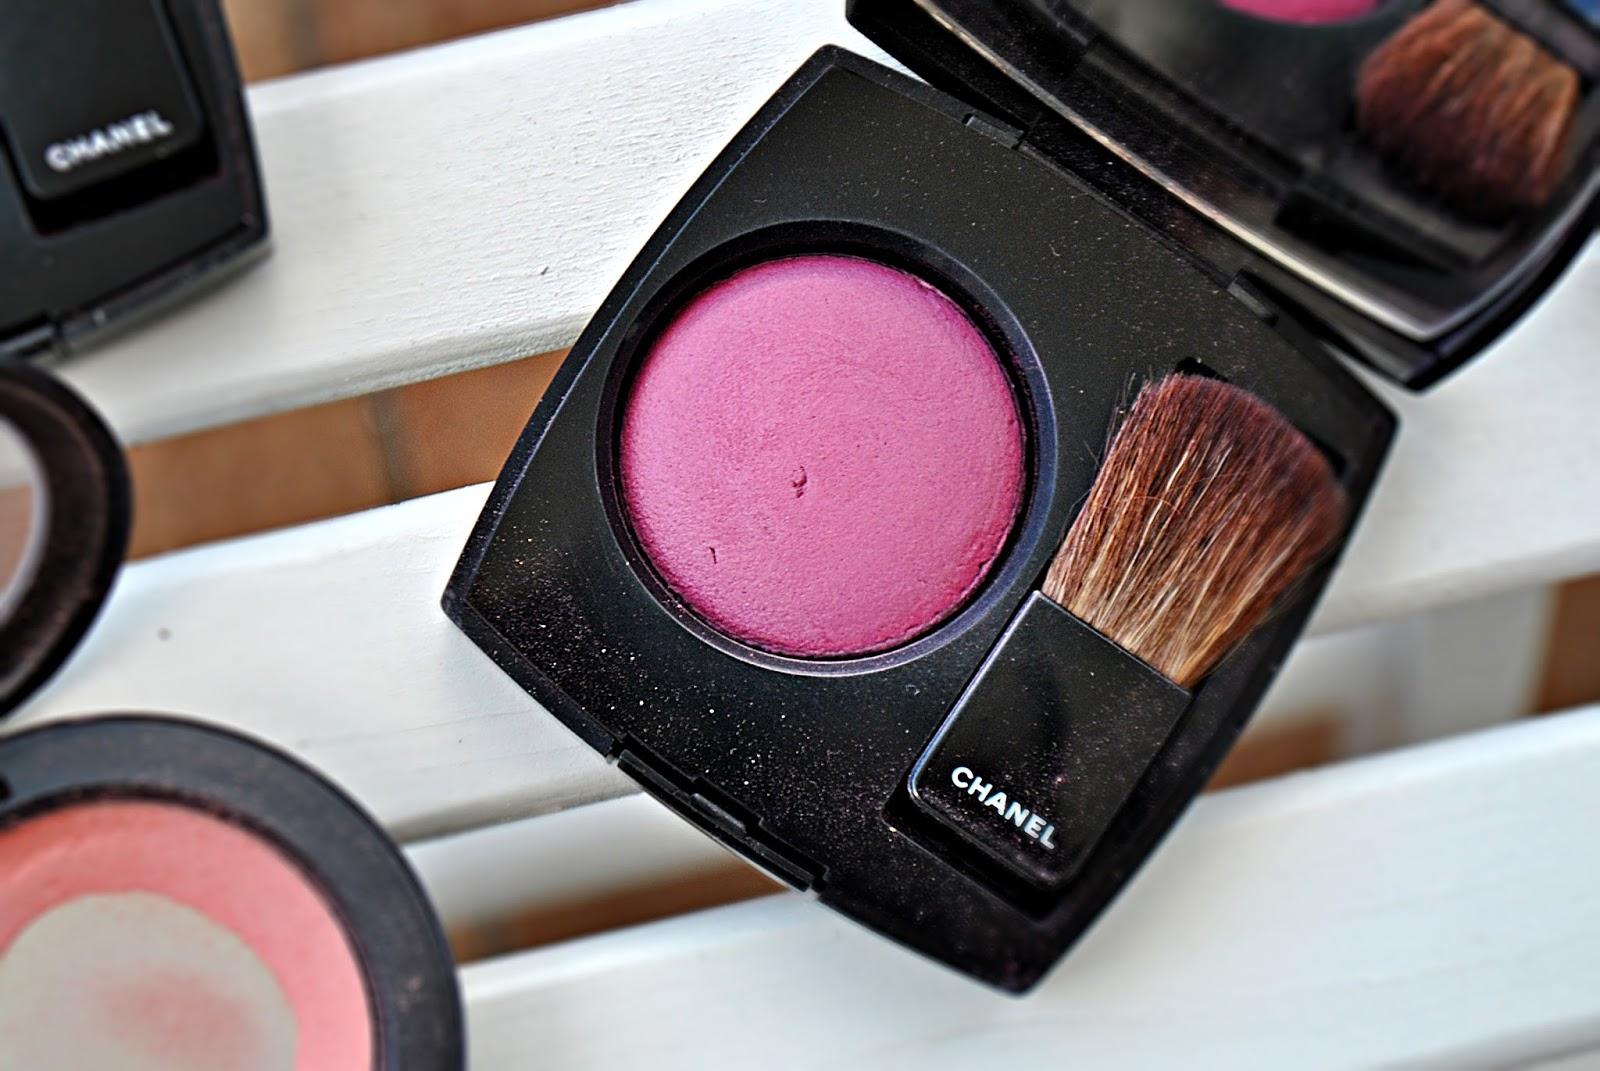 Chanel - Jouse Contraste Powder Blush - 88 Vivacite